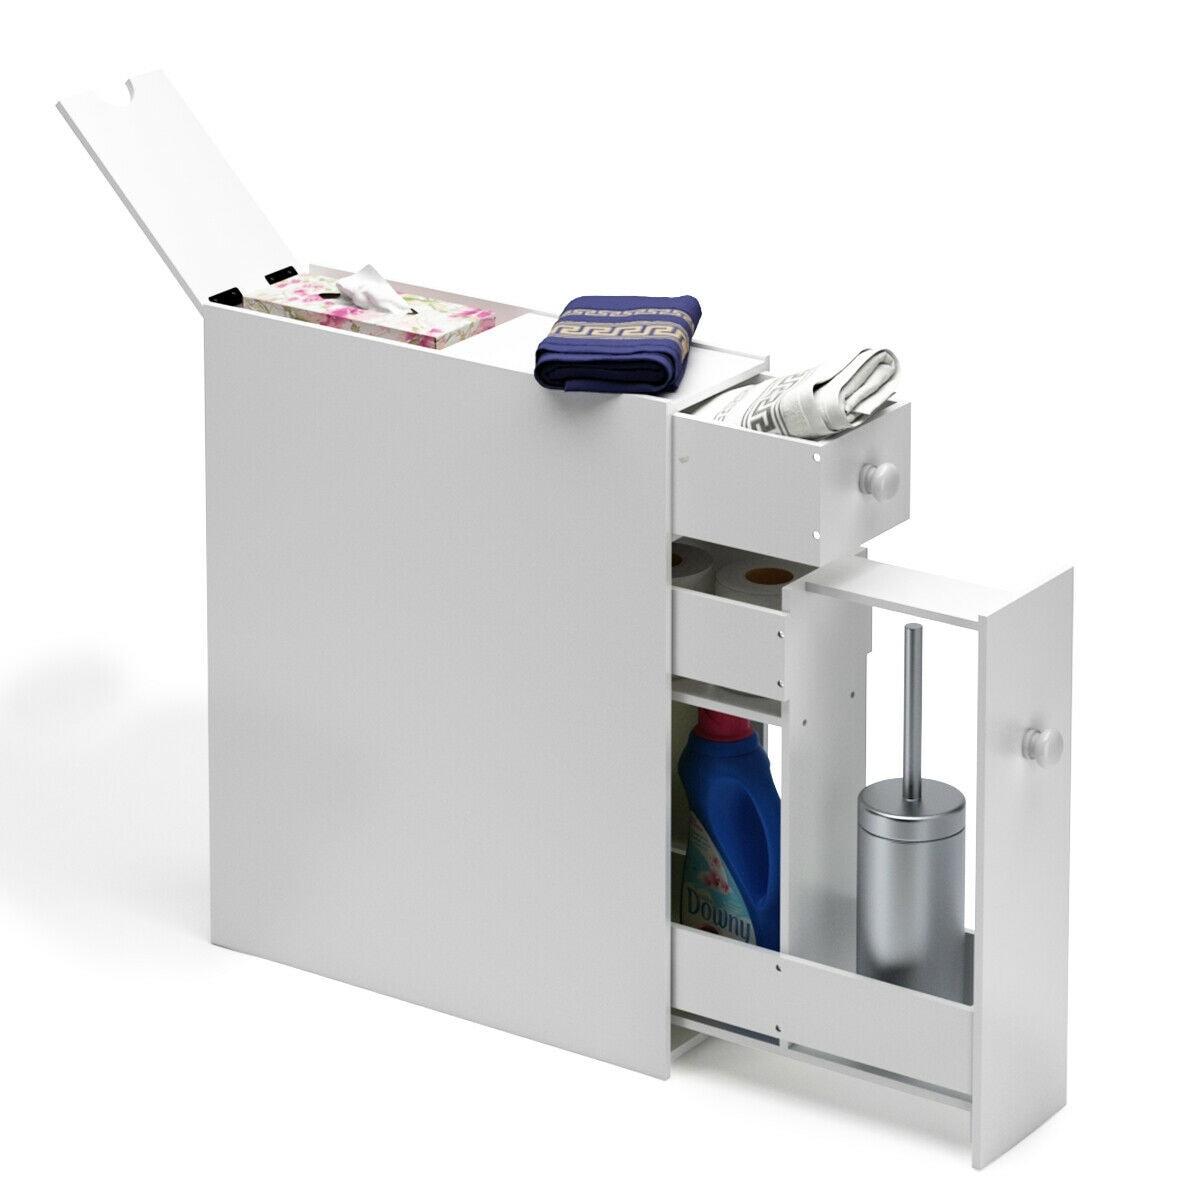 Ordinaire Narrow Wood Floor Bathroom Storage Cabinet Holder Organizer